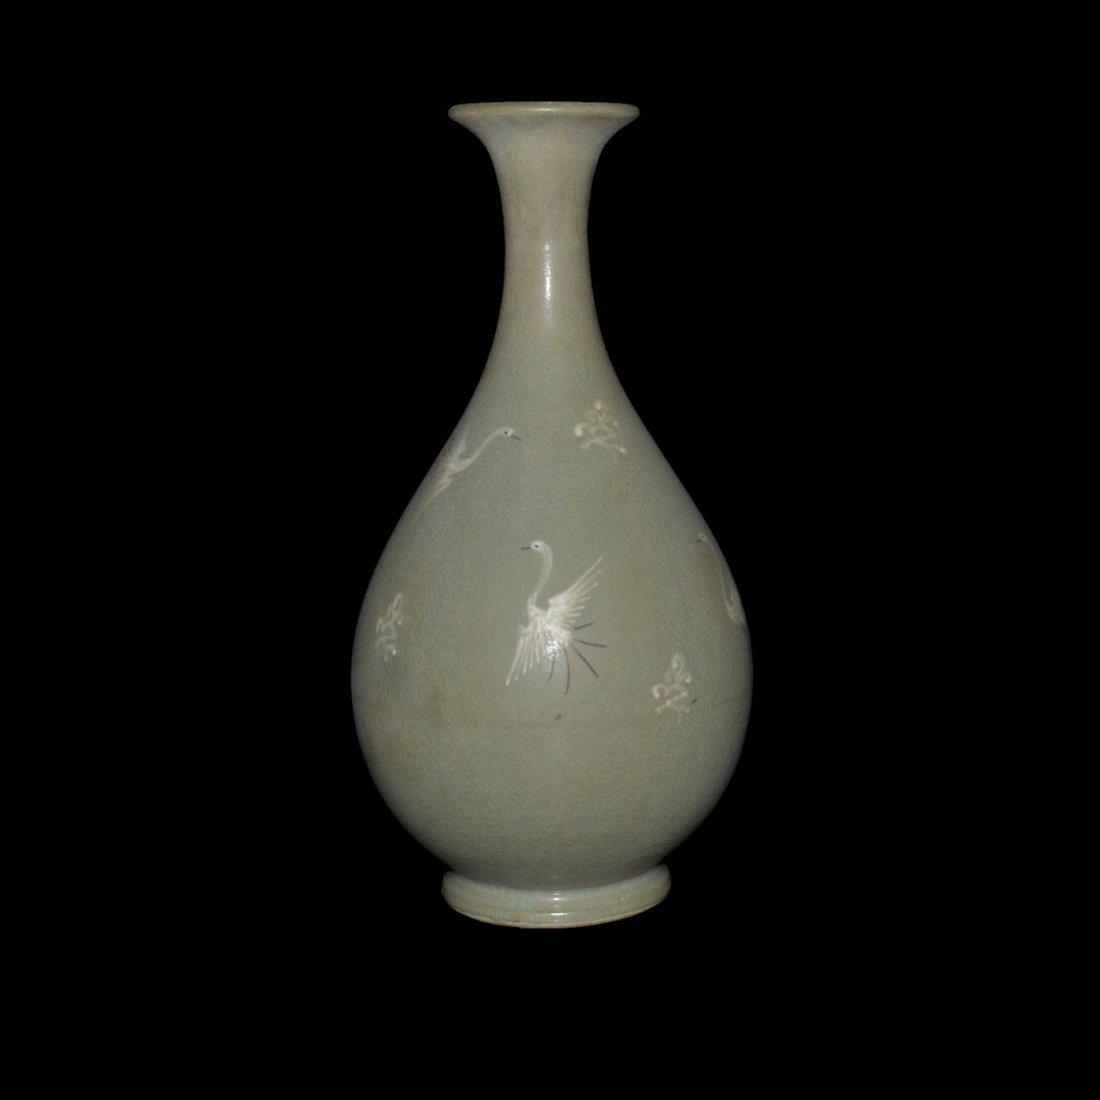 Korean 19th C, Celadon-glazed Yuhuchunping with Cranes